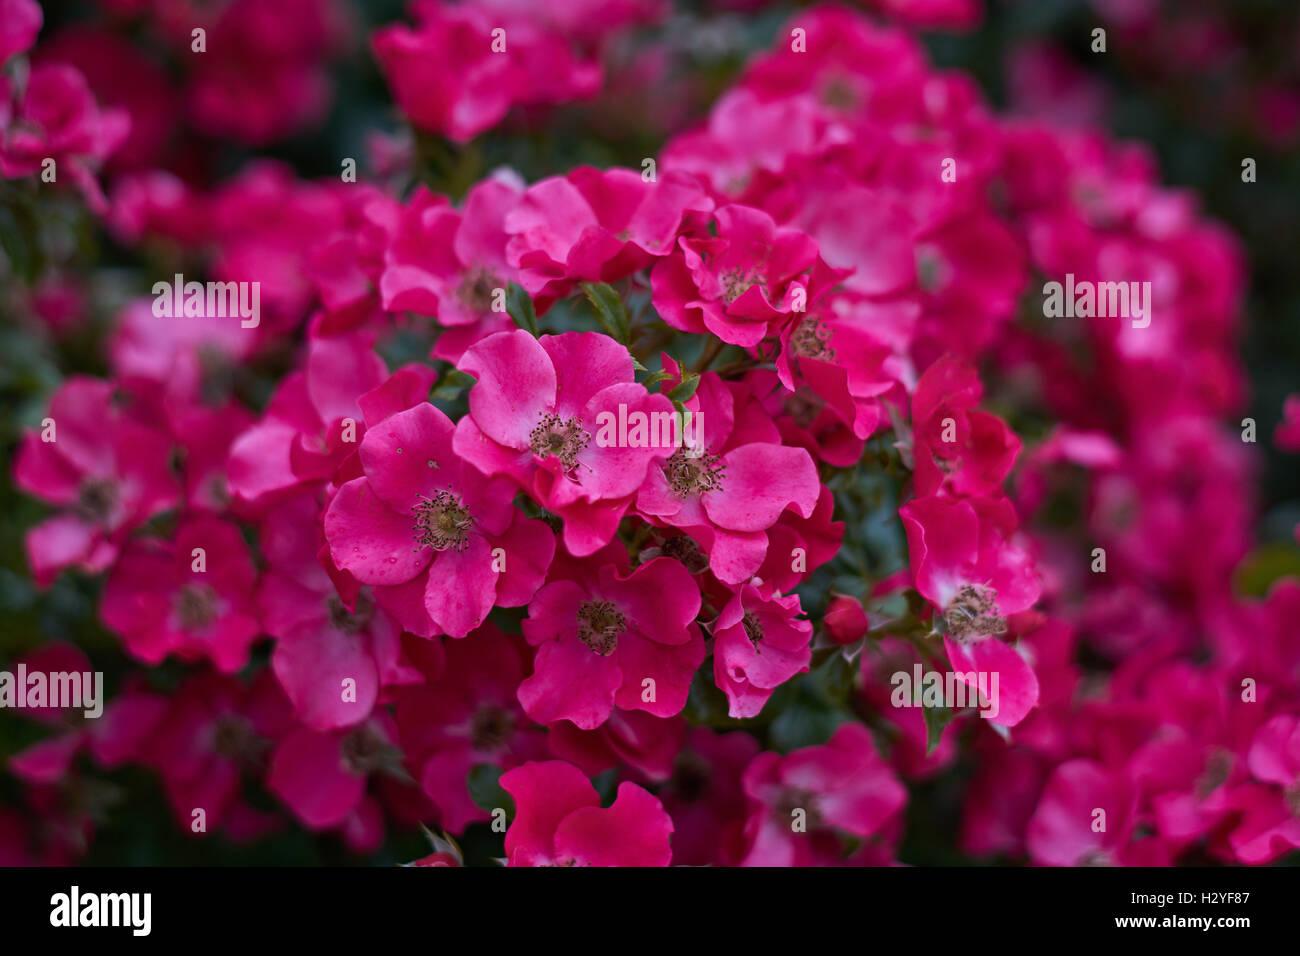 Deep rose pink flowers stock photos deep rose pink flowers stock deep pink lush rose roses flowers in cluster stock image mightylinksfo